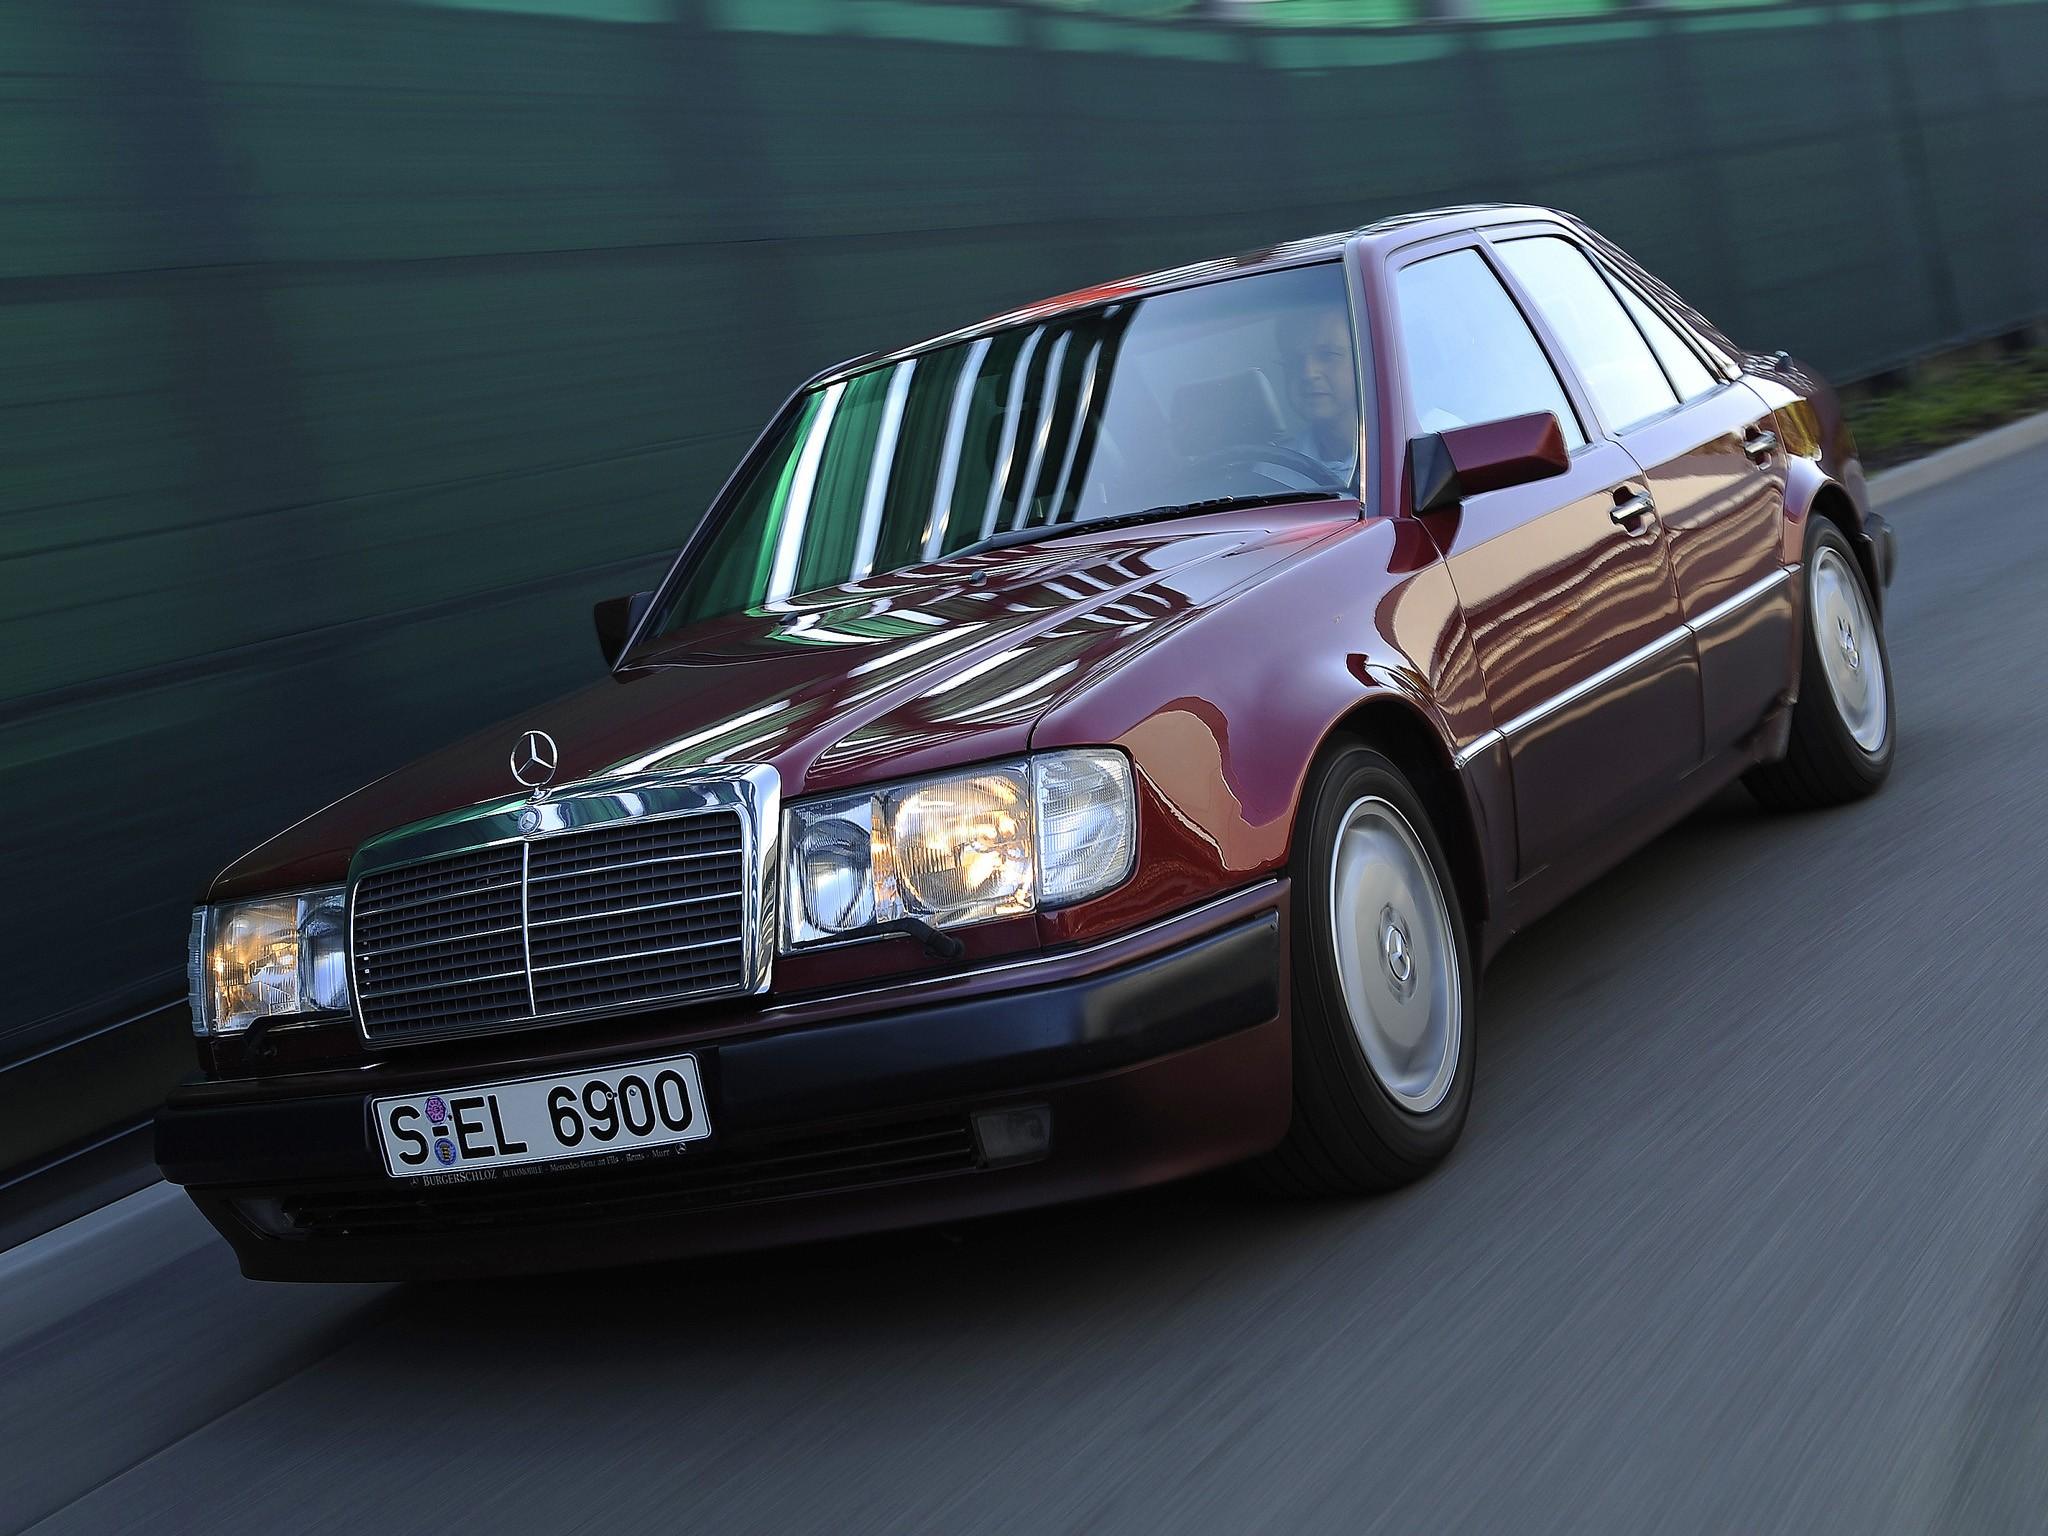 Mercedes benz 500 e w124 specs 1991 1992 1993 for Mercedes benz gas chambers